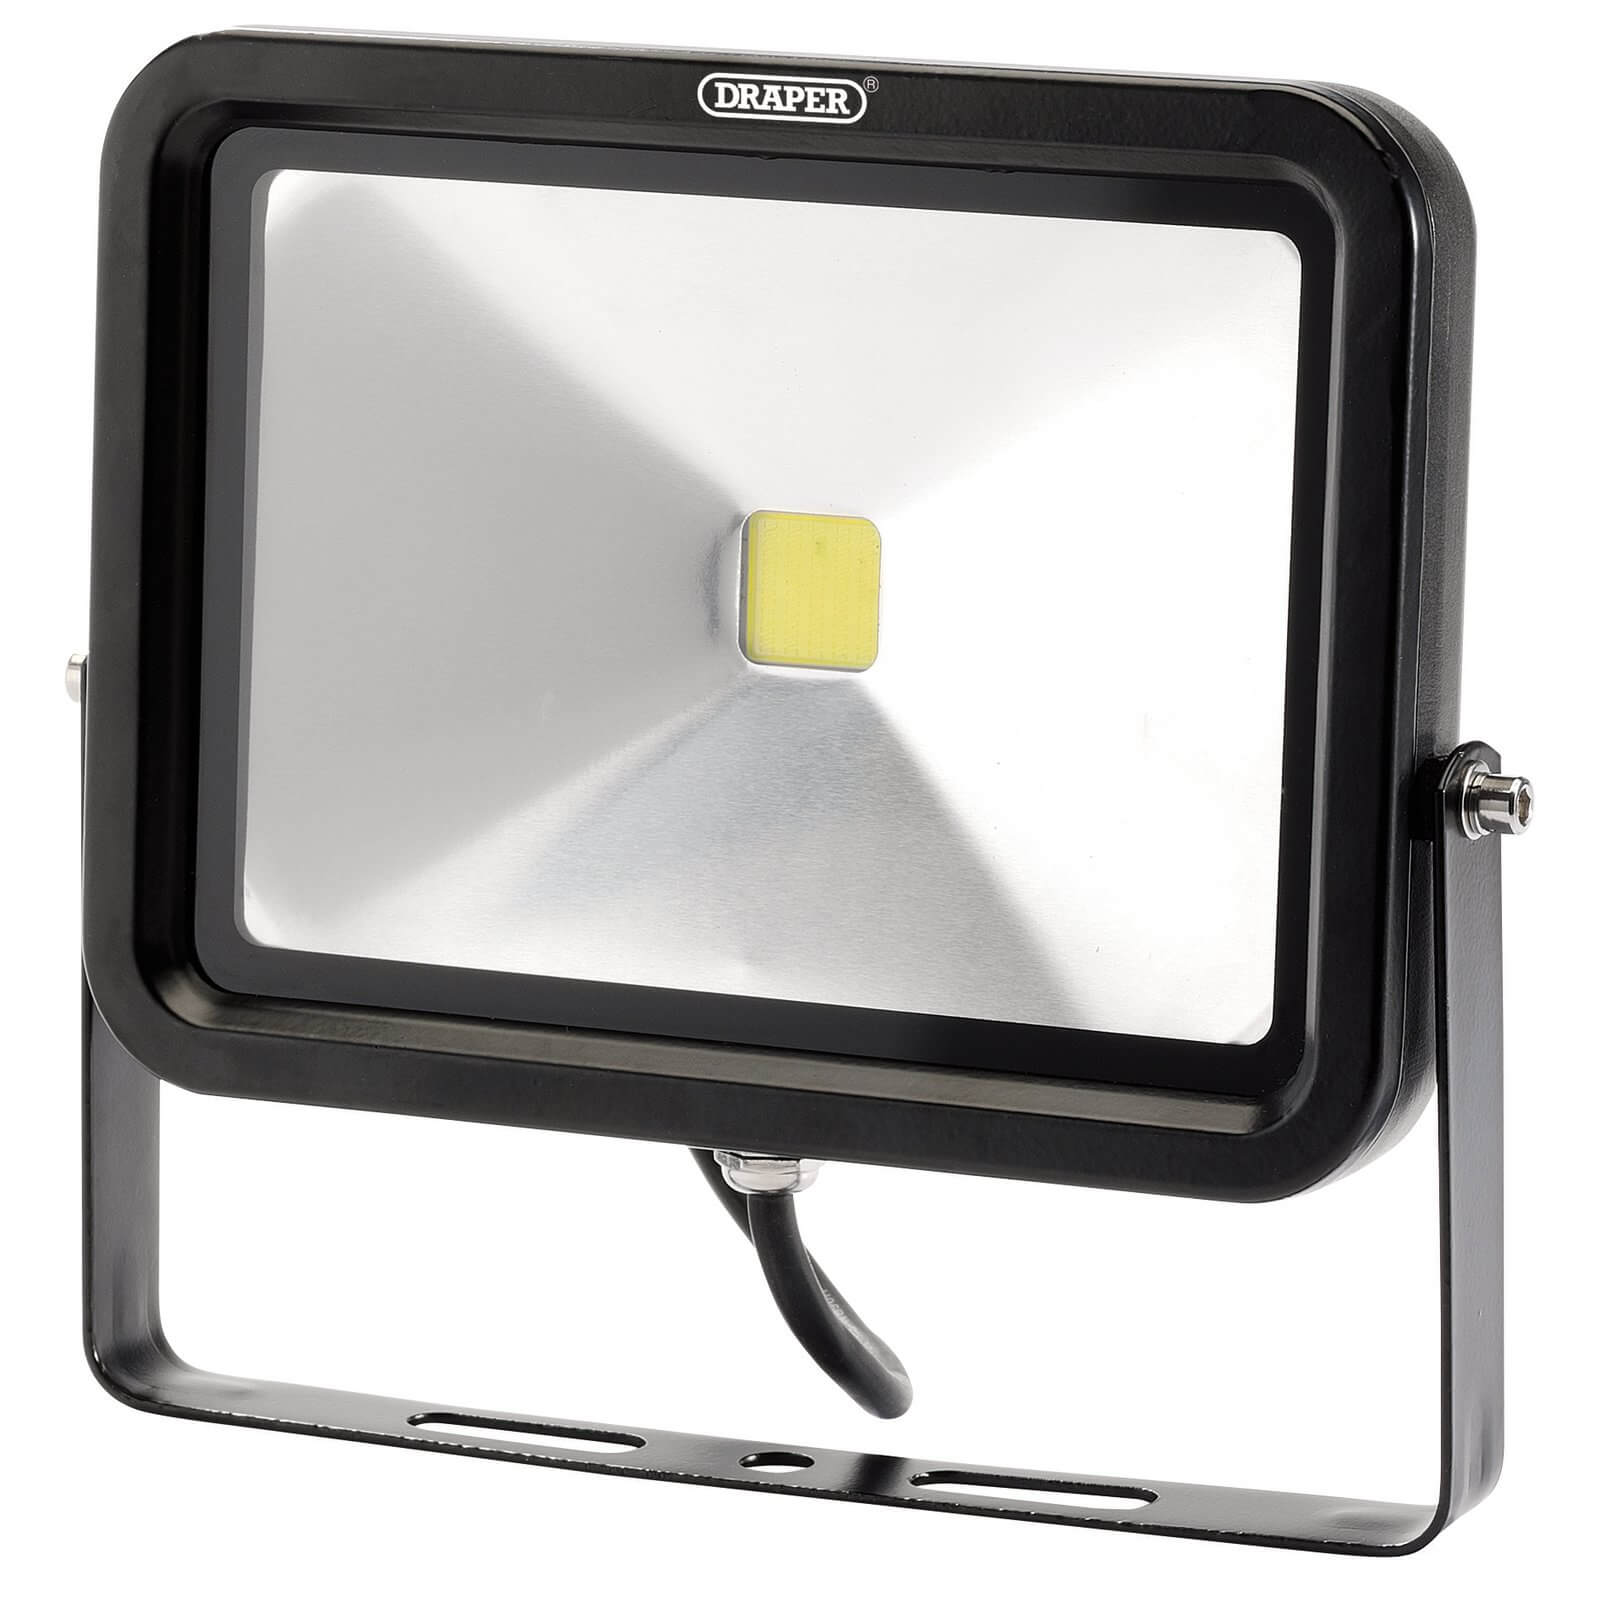 Image of Draper COB LED Slimeline Wall Mounted Floodlight 50 Watts